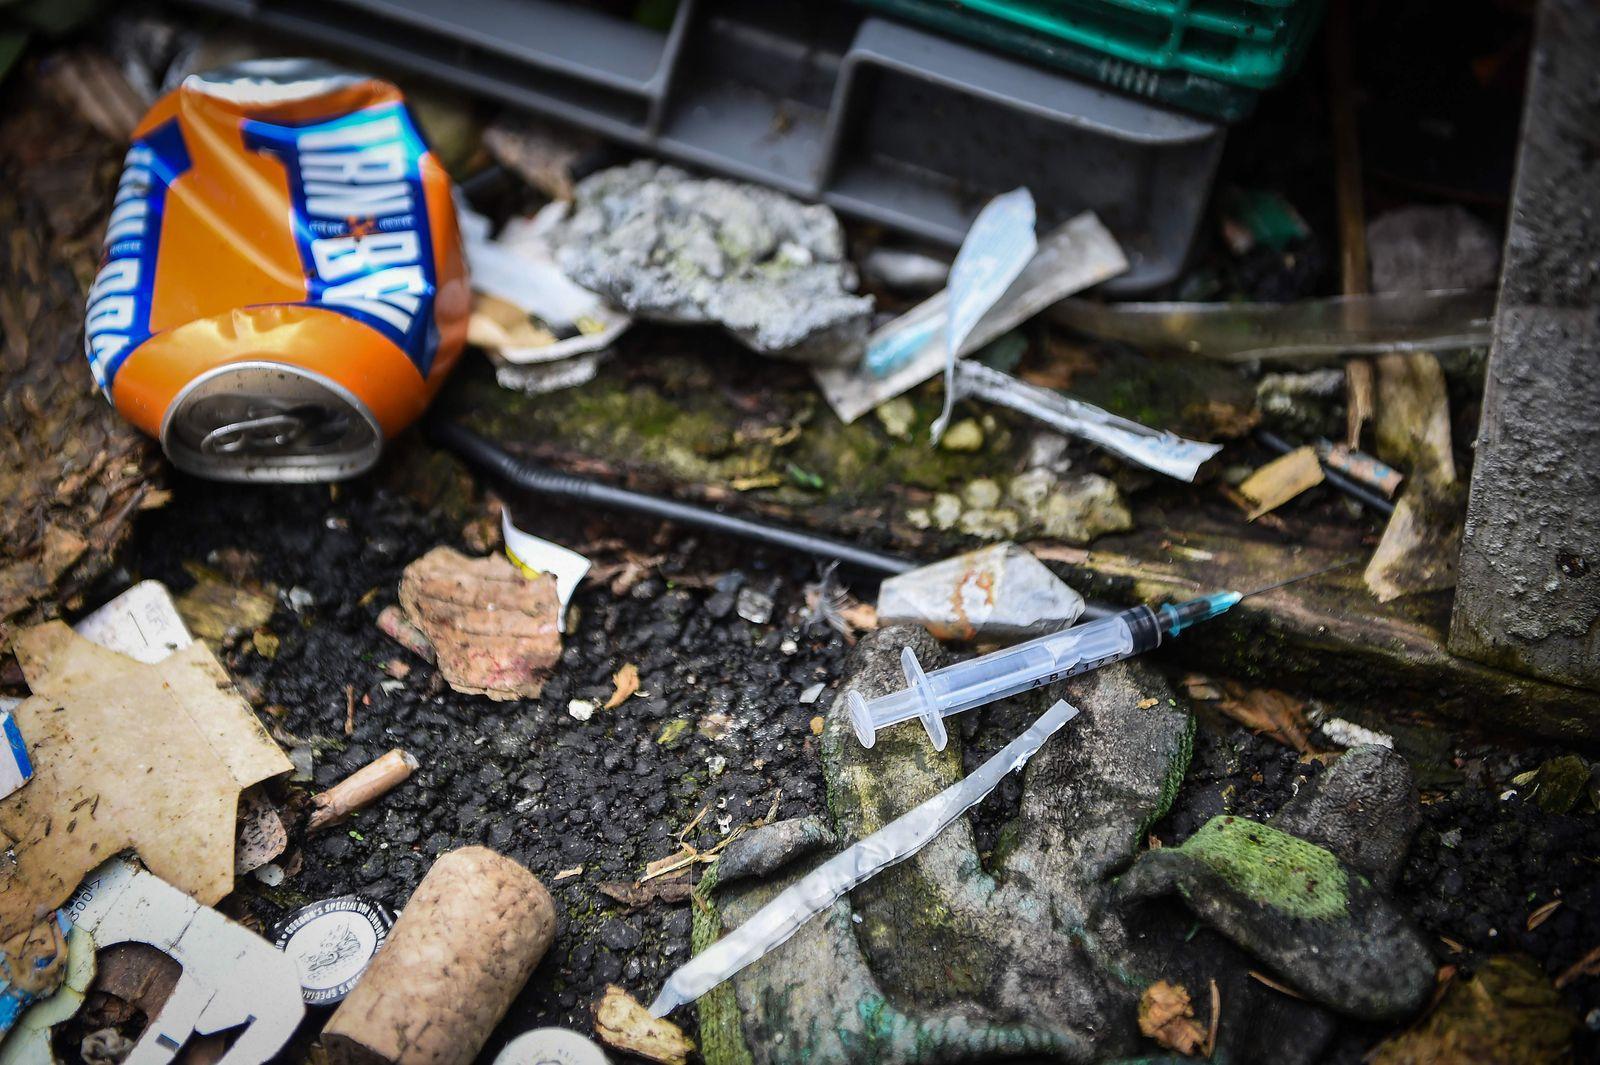 BRITAIN-SCOTLAND-DRUGS